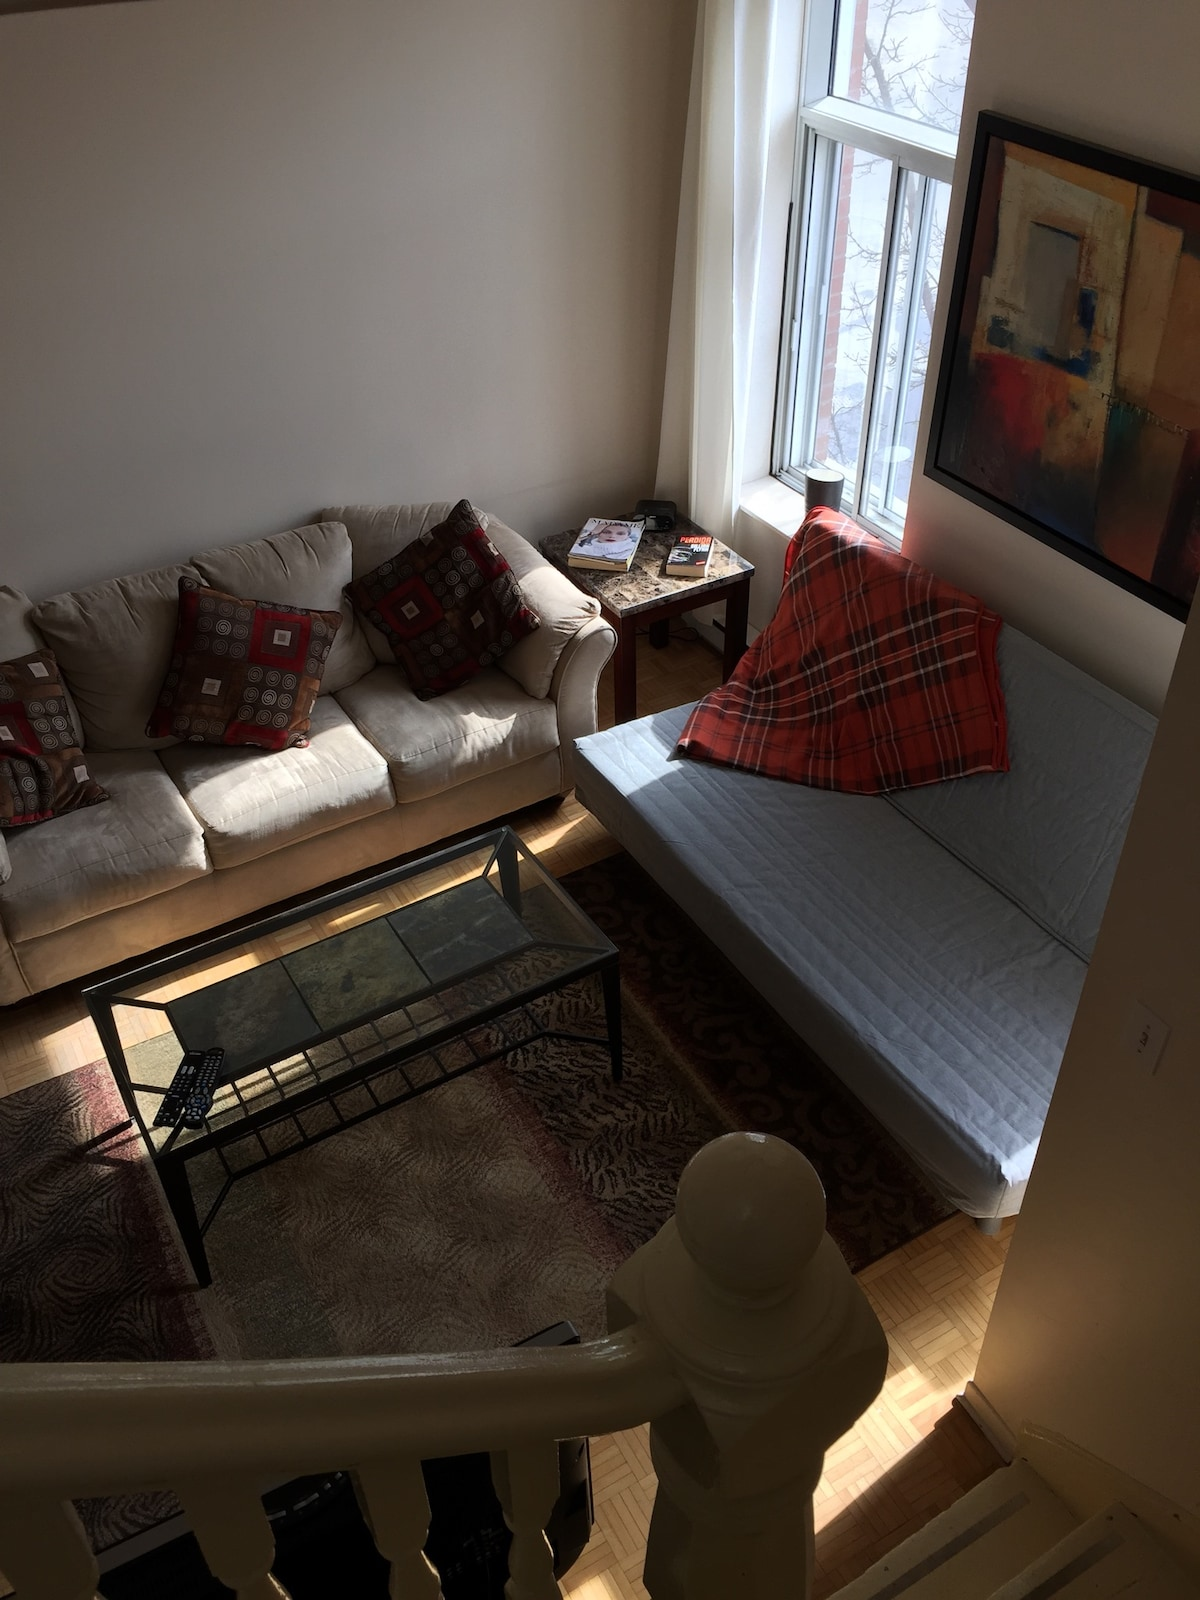 a regular sofa plus a futon that sleeps 2(queen size)